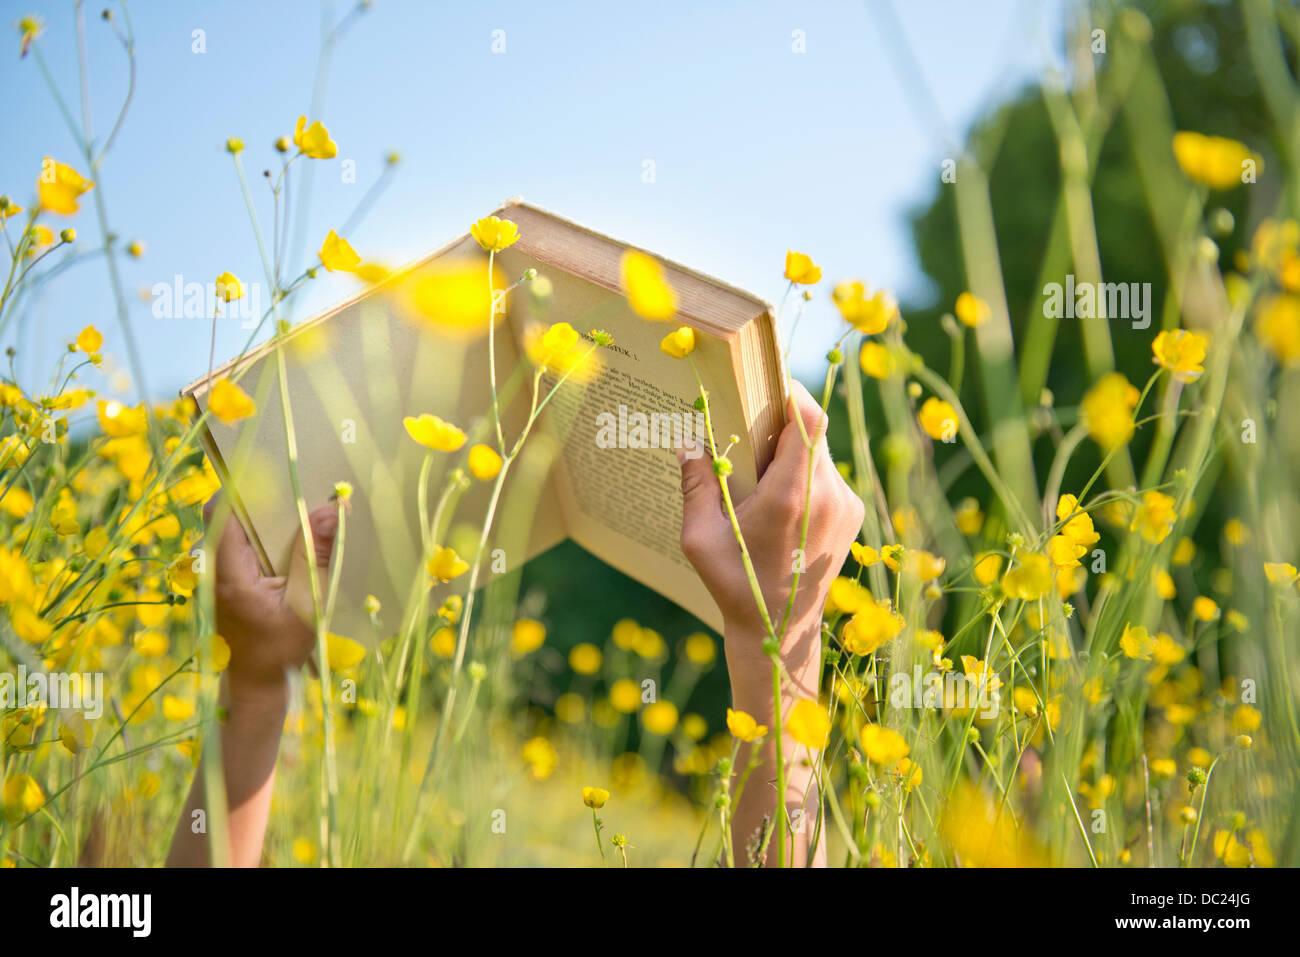 Cropped shot of woman's hands holding livre dans l'herbe haute Photo Stock